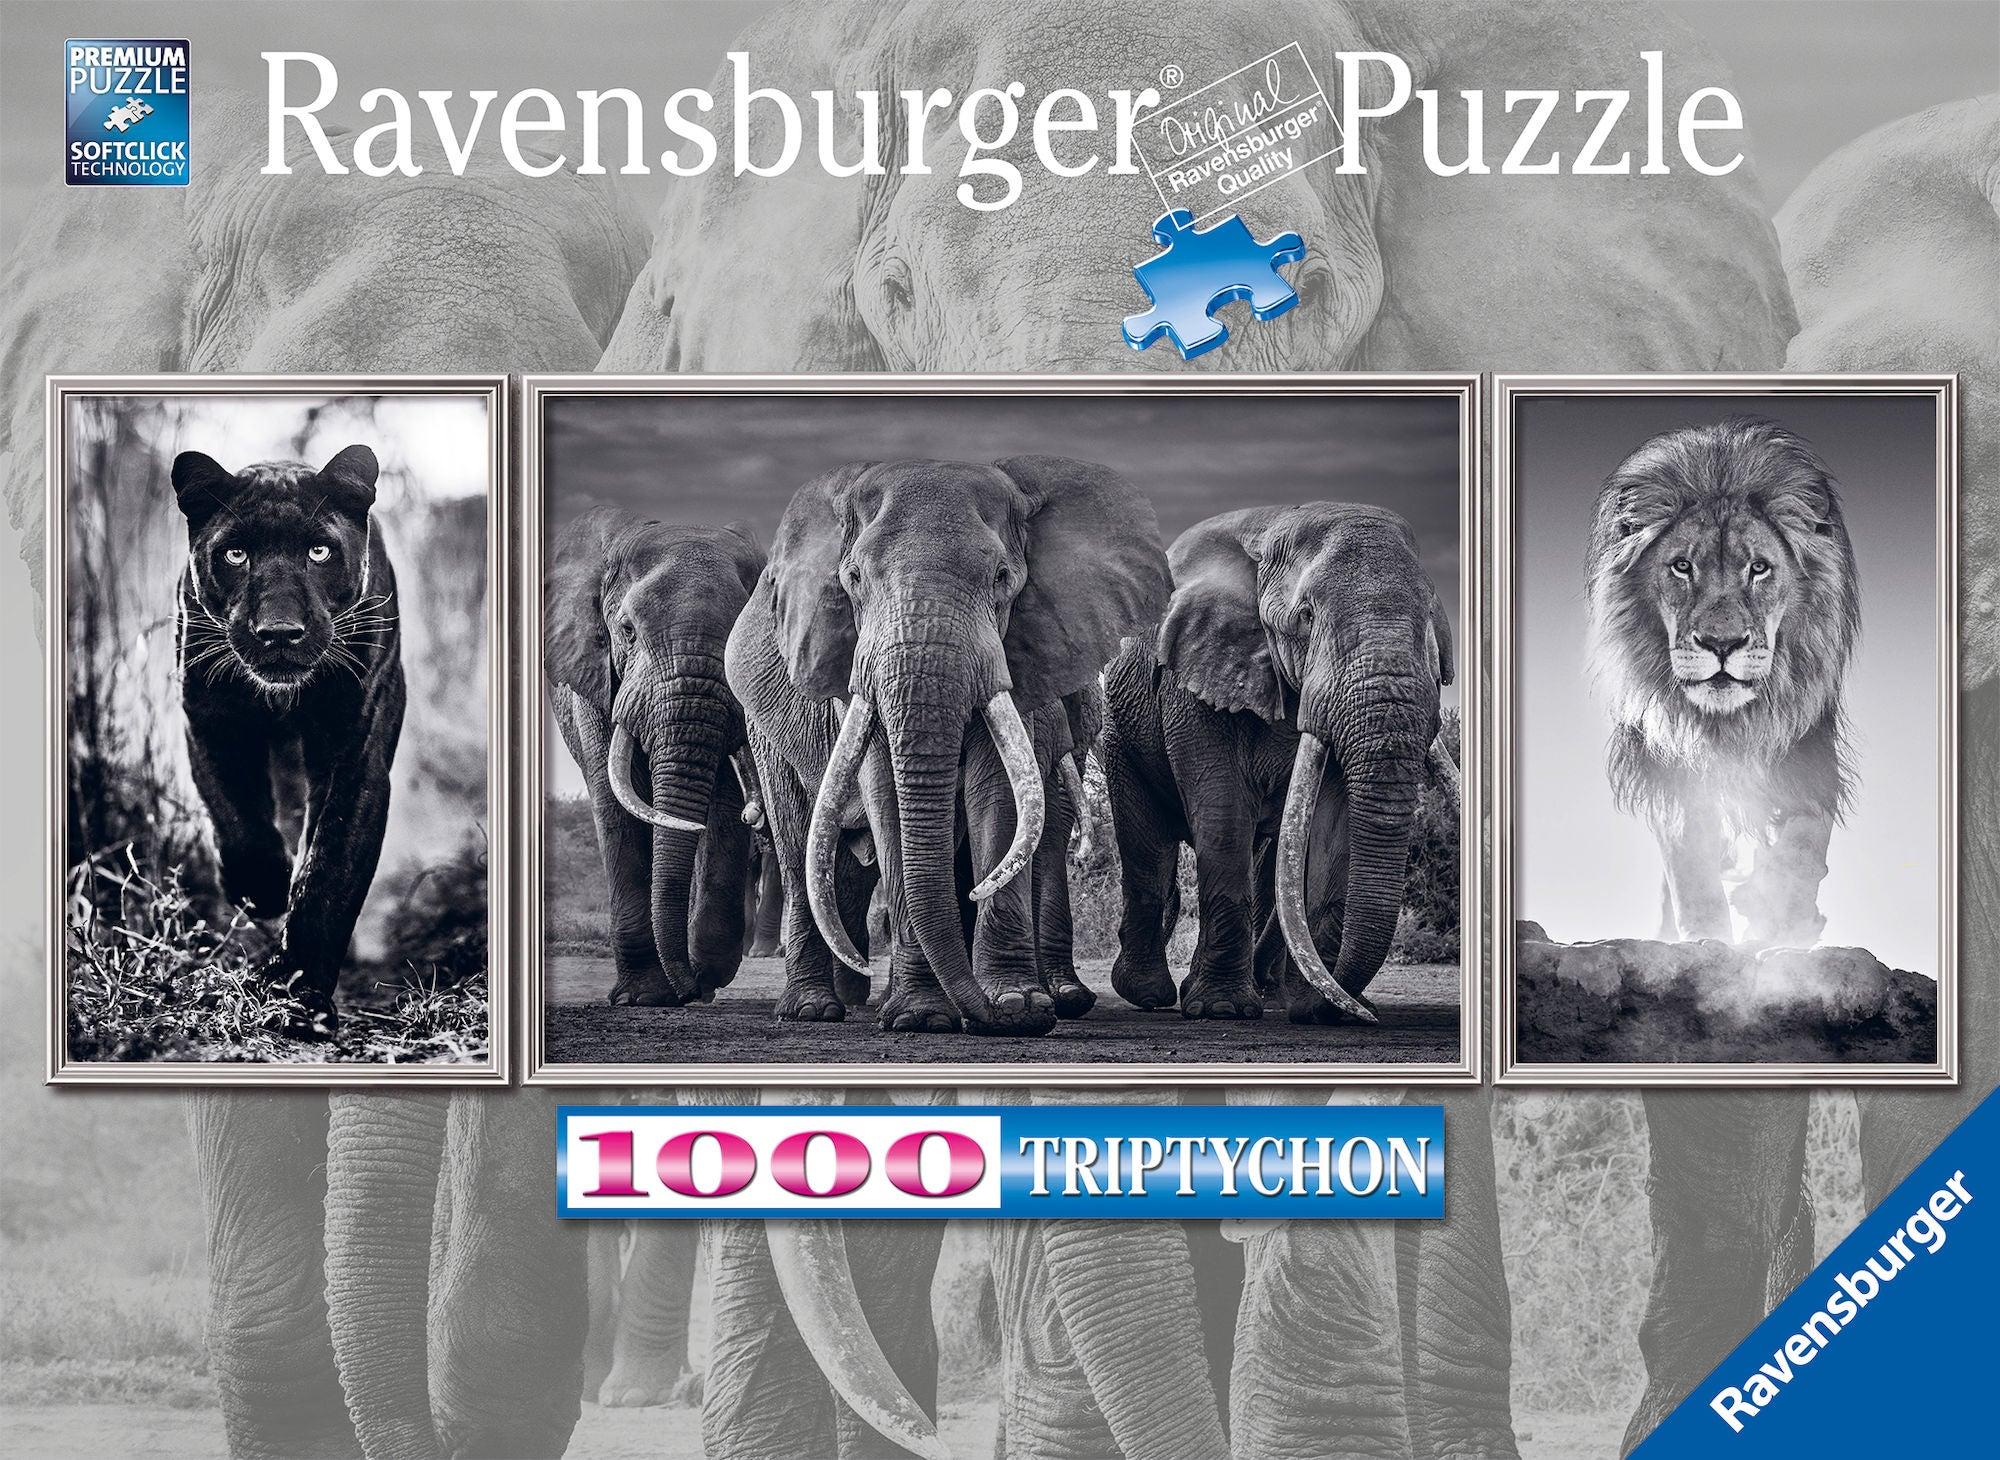 Ravensburger Pussel Svartvita Djur 1000 Bitar